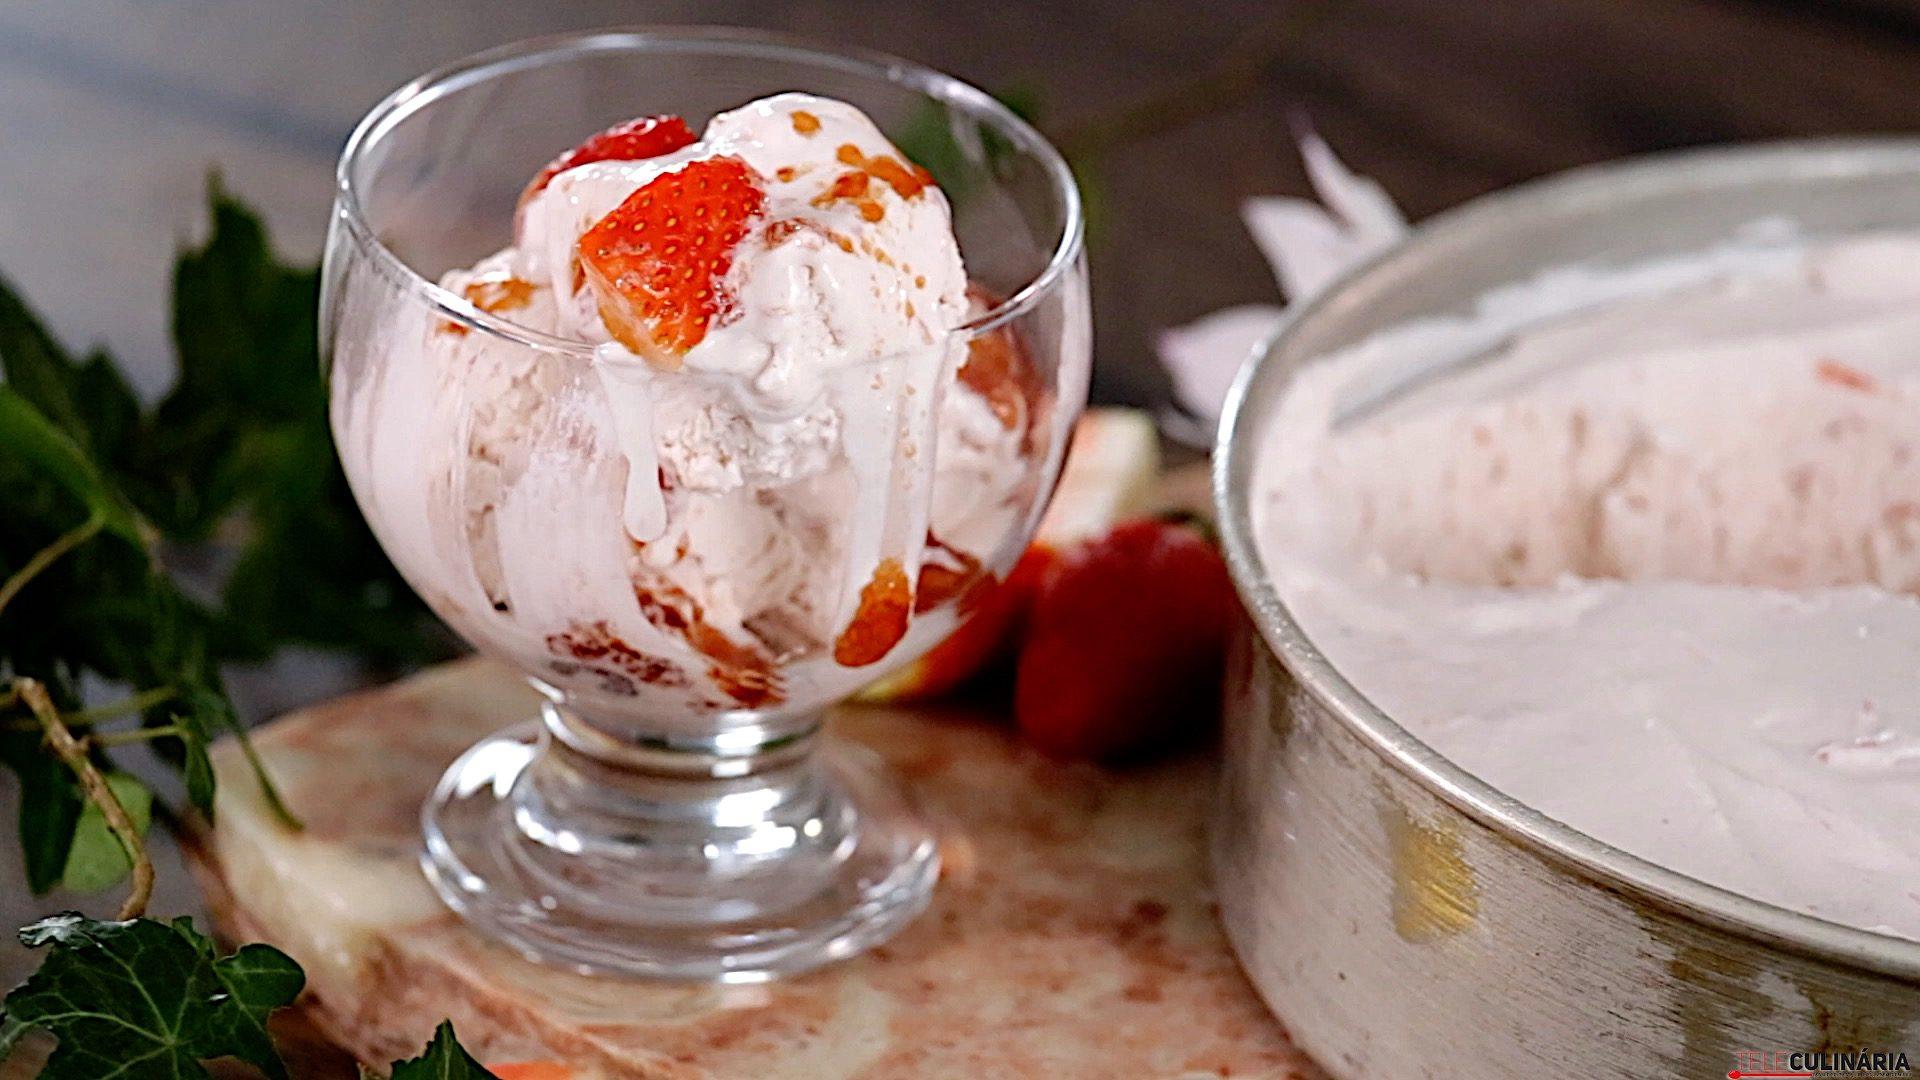 J0029 gelado de morango CHSB